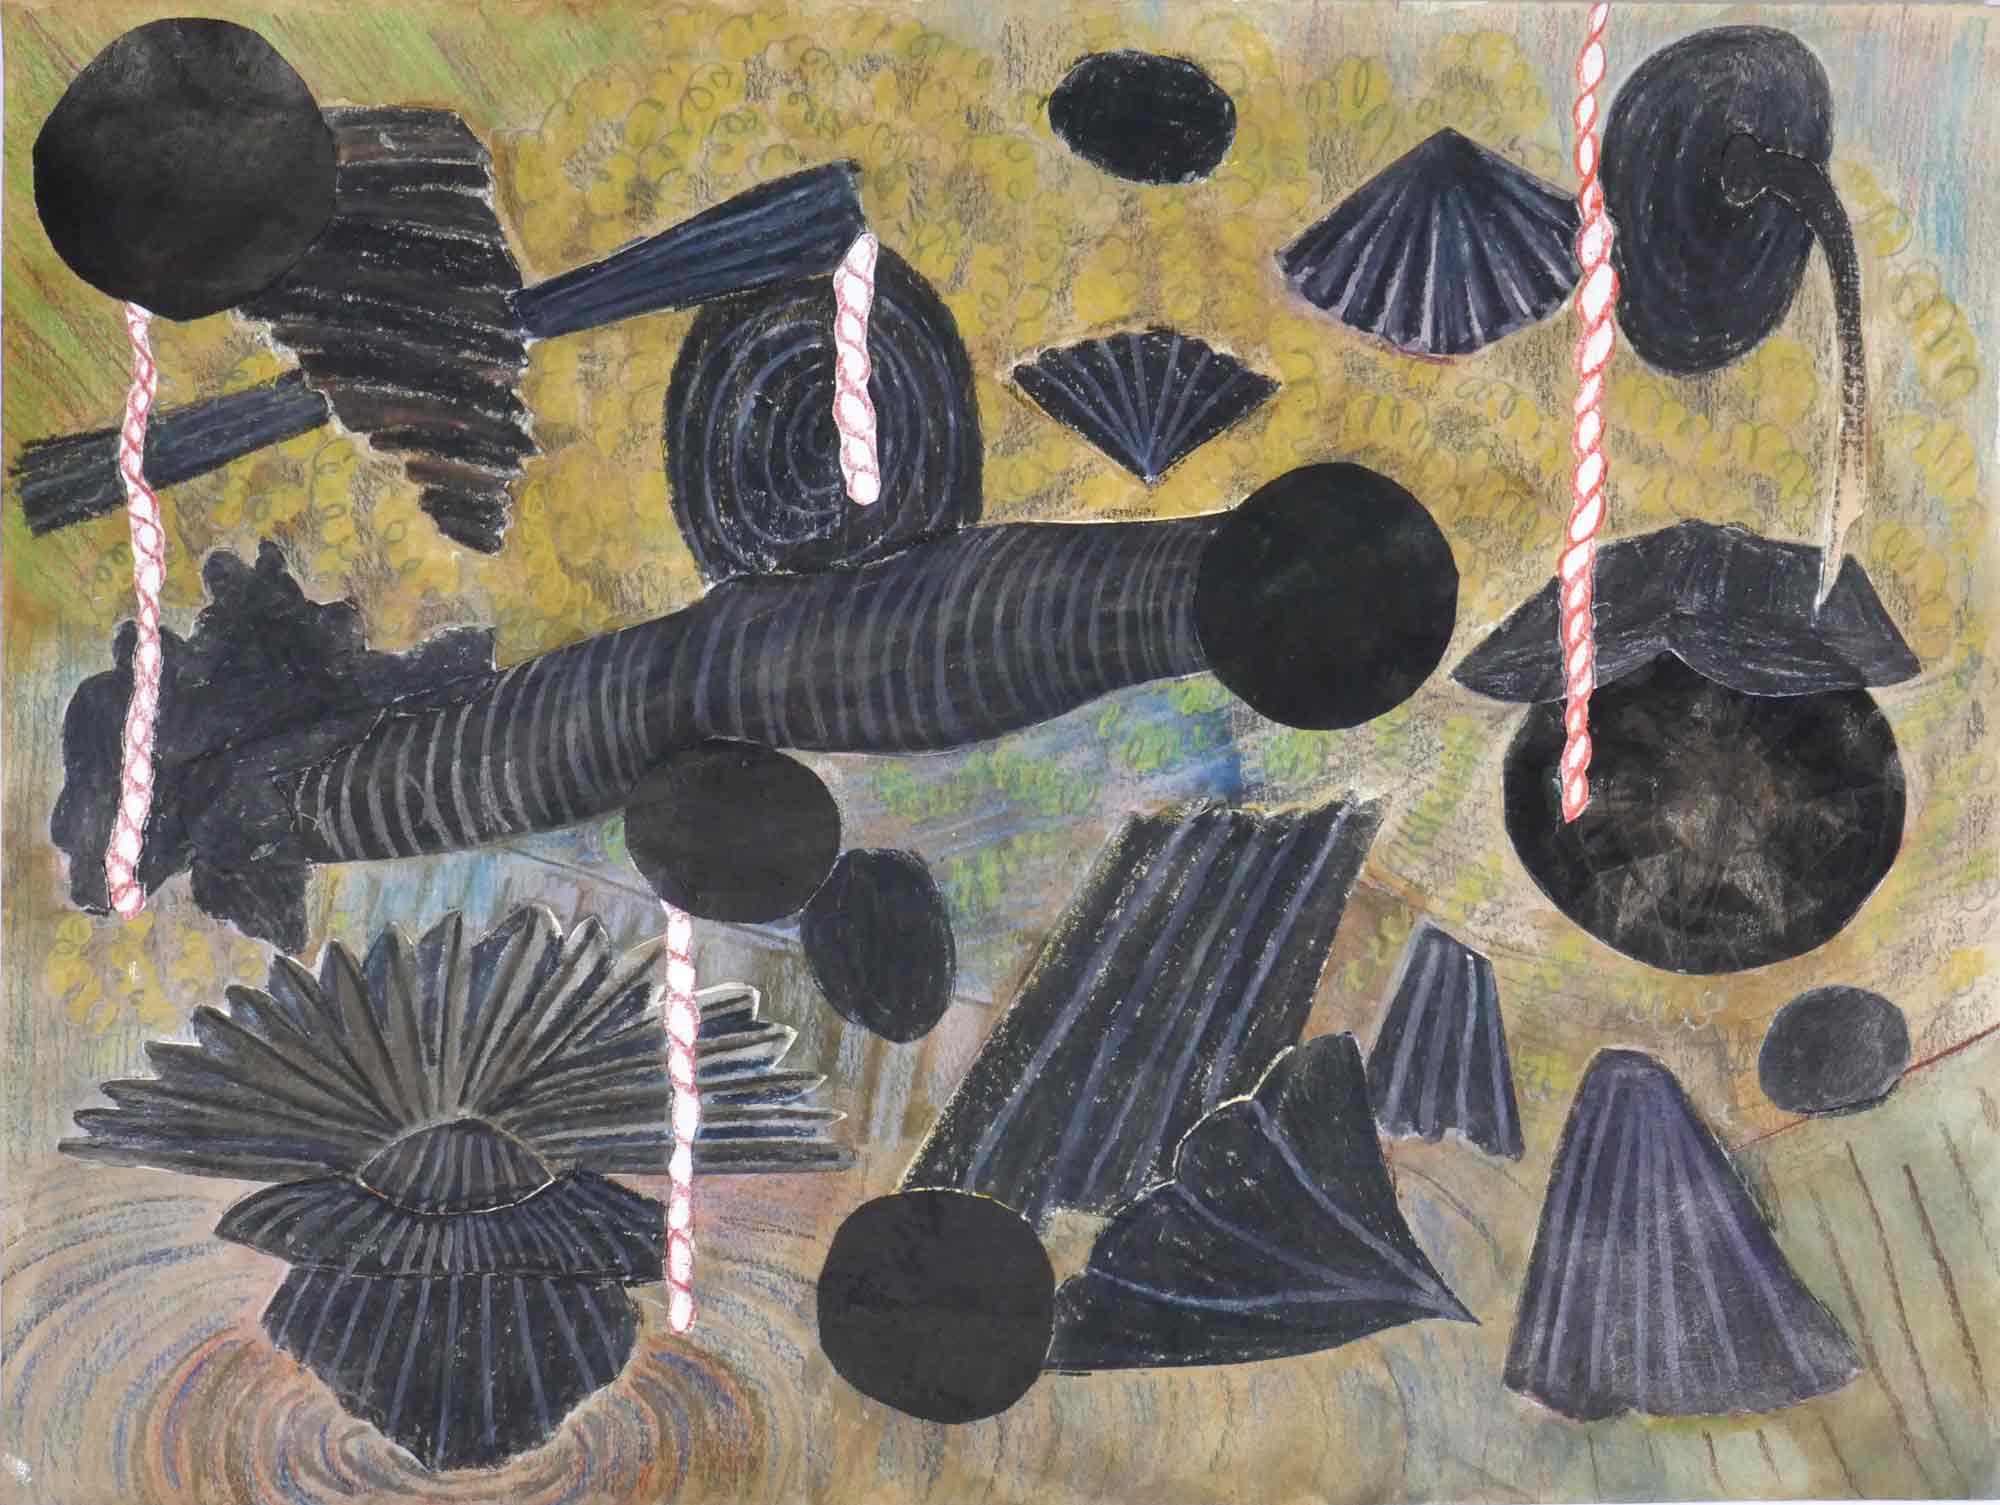 Gepeins (Brooding)  collage; inkt, potlood, aquarel 24 x 32 cm, 2017